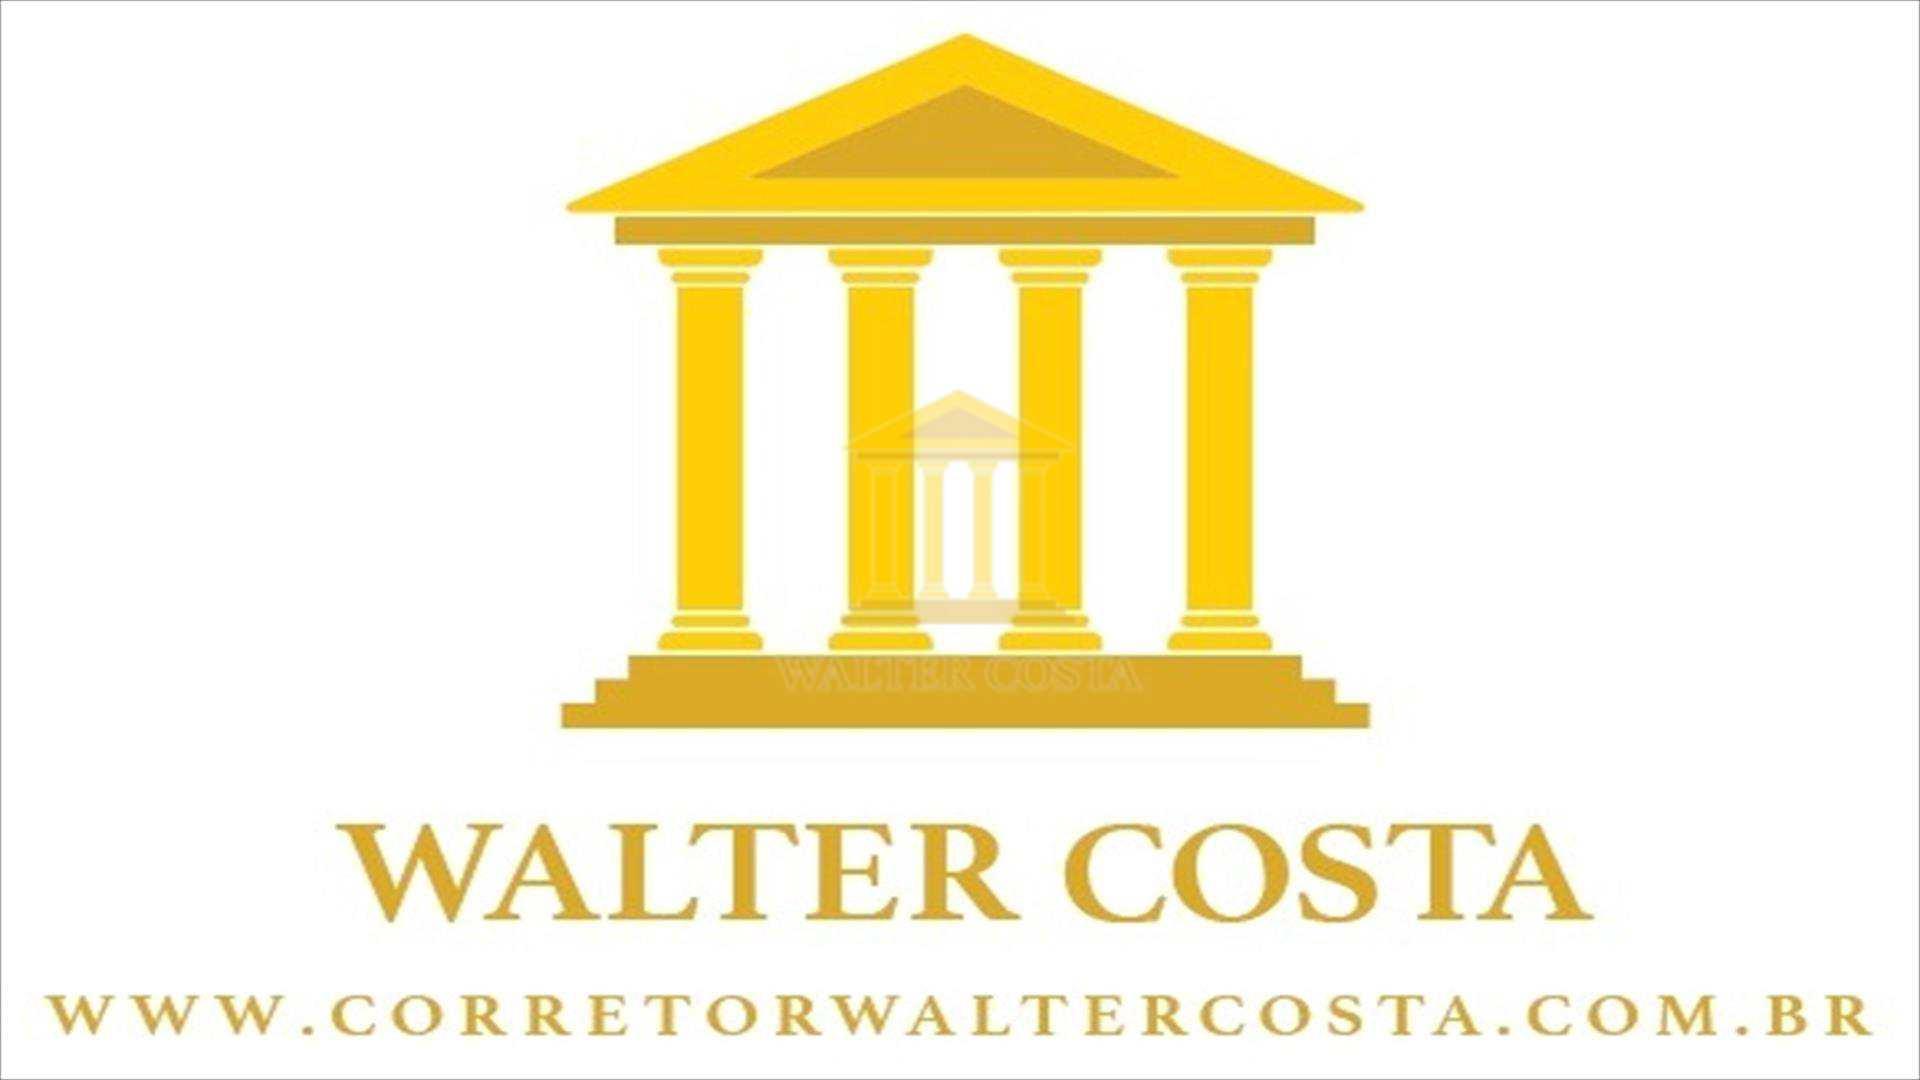 11500-LOGO_CORRETOR_WALTER_COSTA_NOVO.jpg